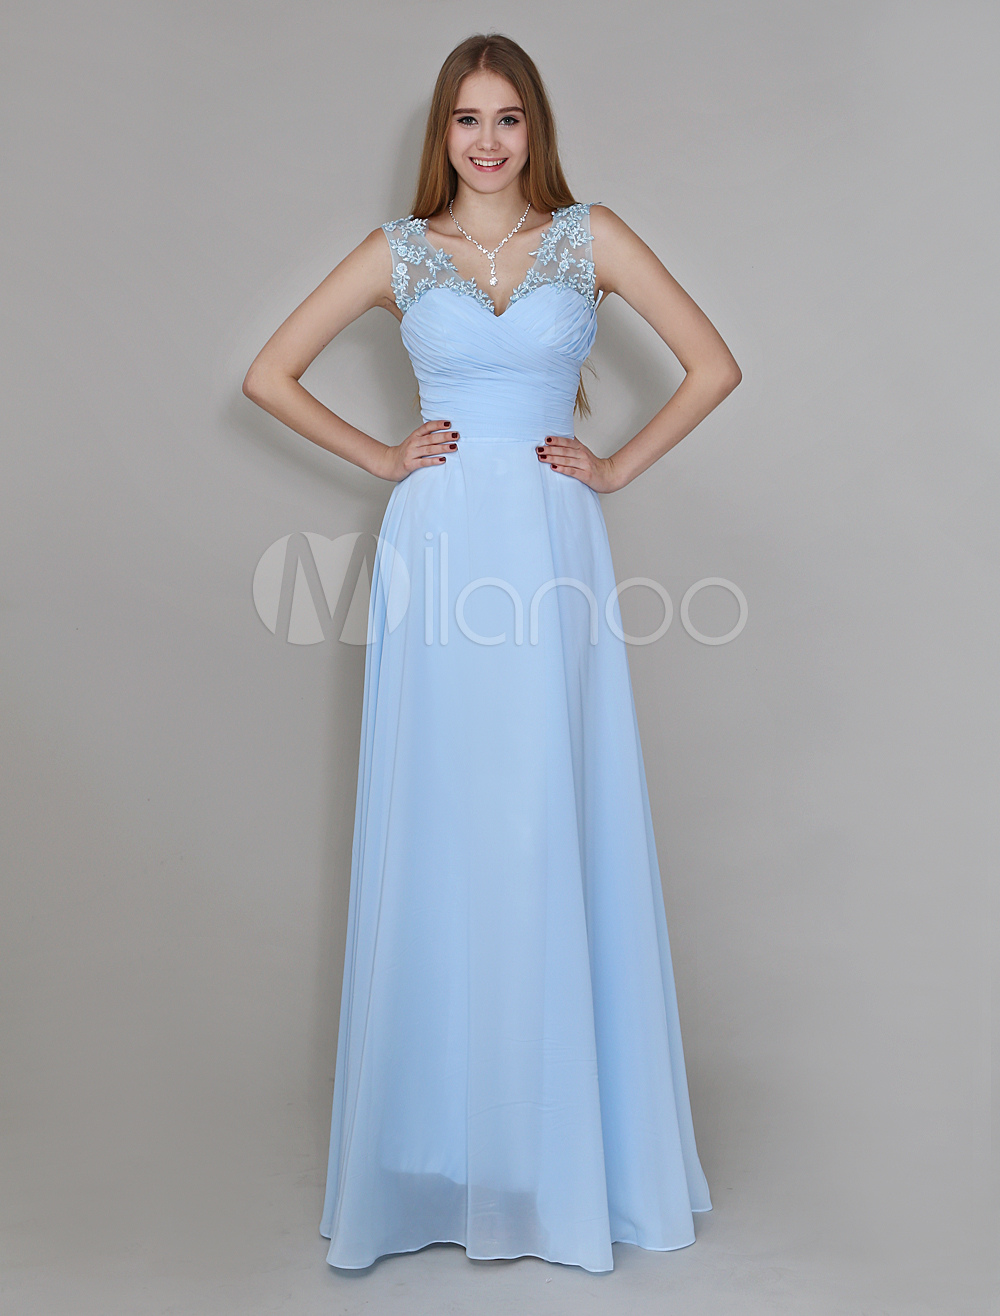 Light Sky Blue V-Neck Floor-Length Chiffon Bridesmaid Dress With Flower On Shoulder